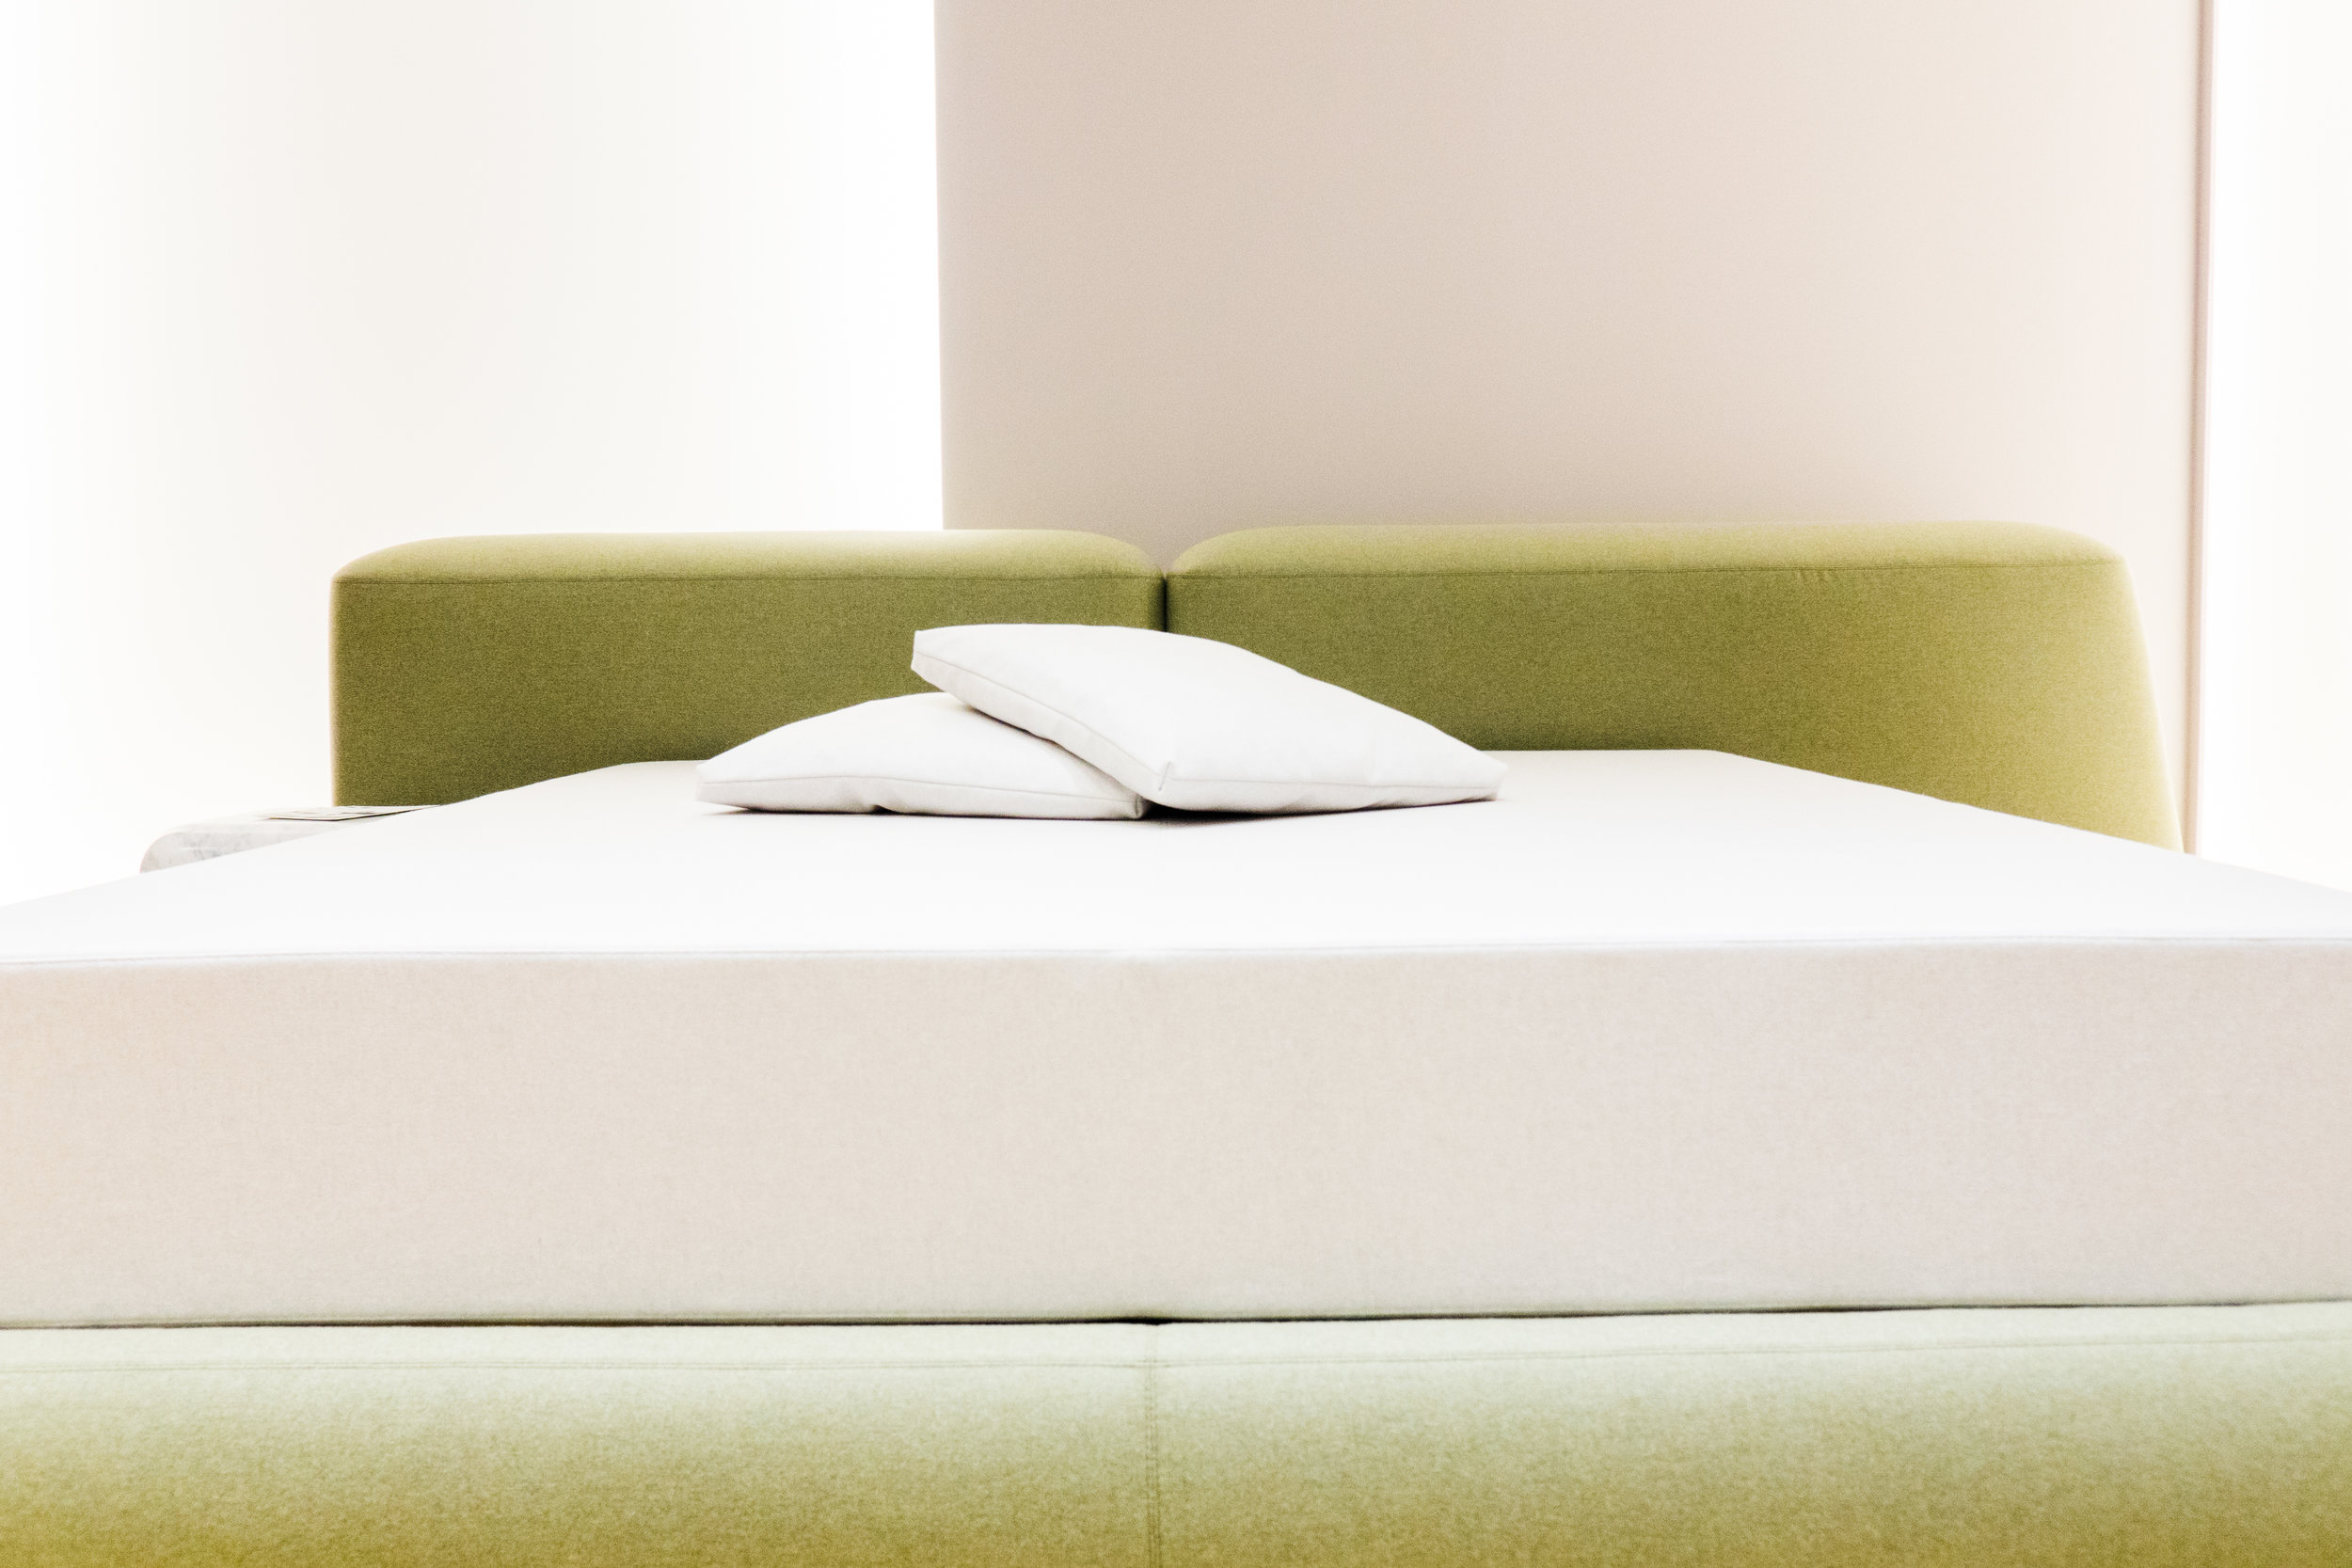 Lapis bed -2019, Salone del Mobile, Milan, 2019 ⓒ Amura Design: Emanuel Gargano and Anton Cristell